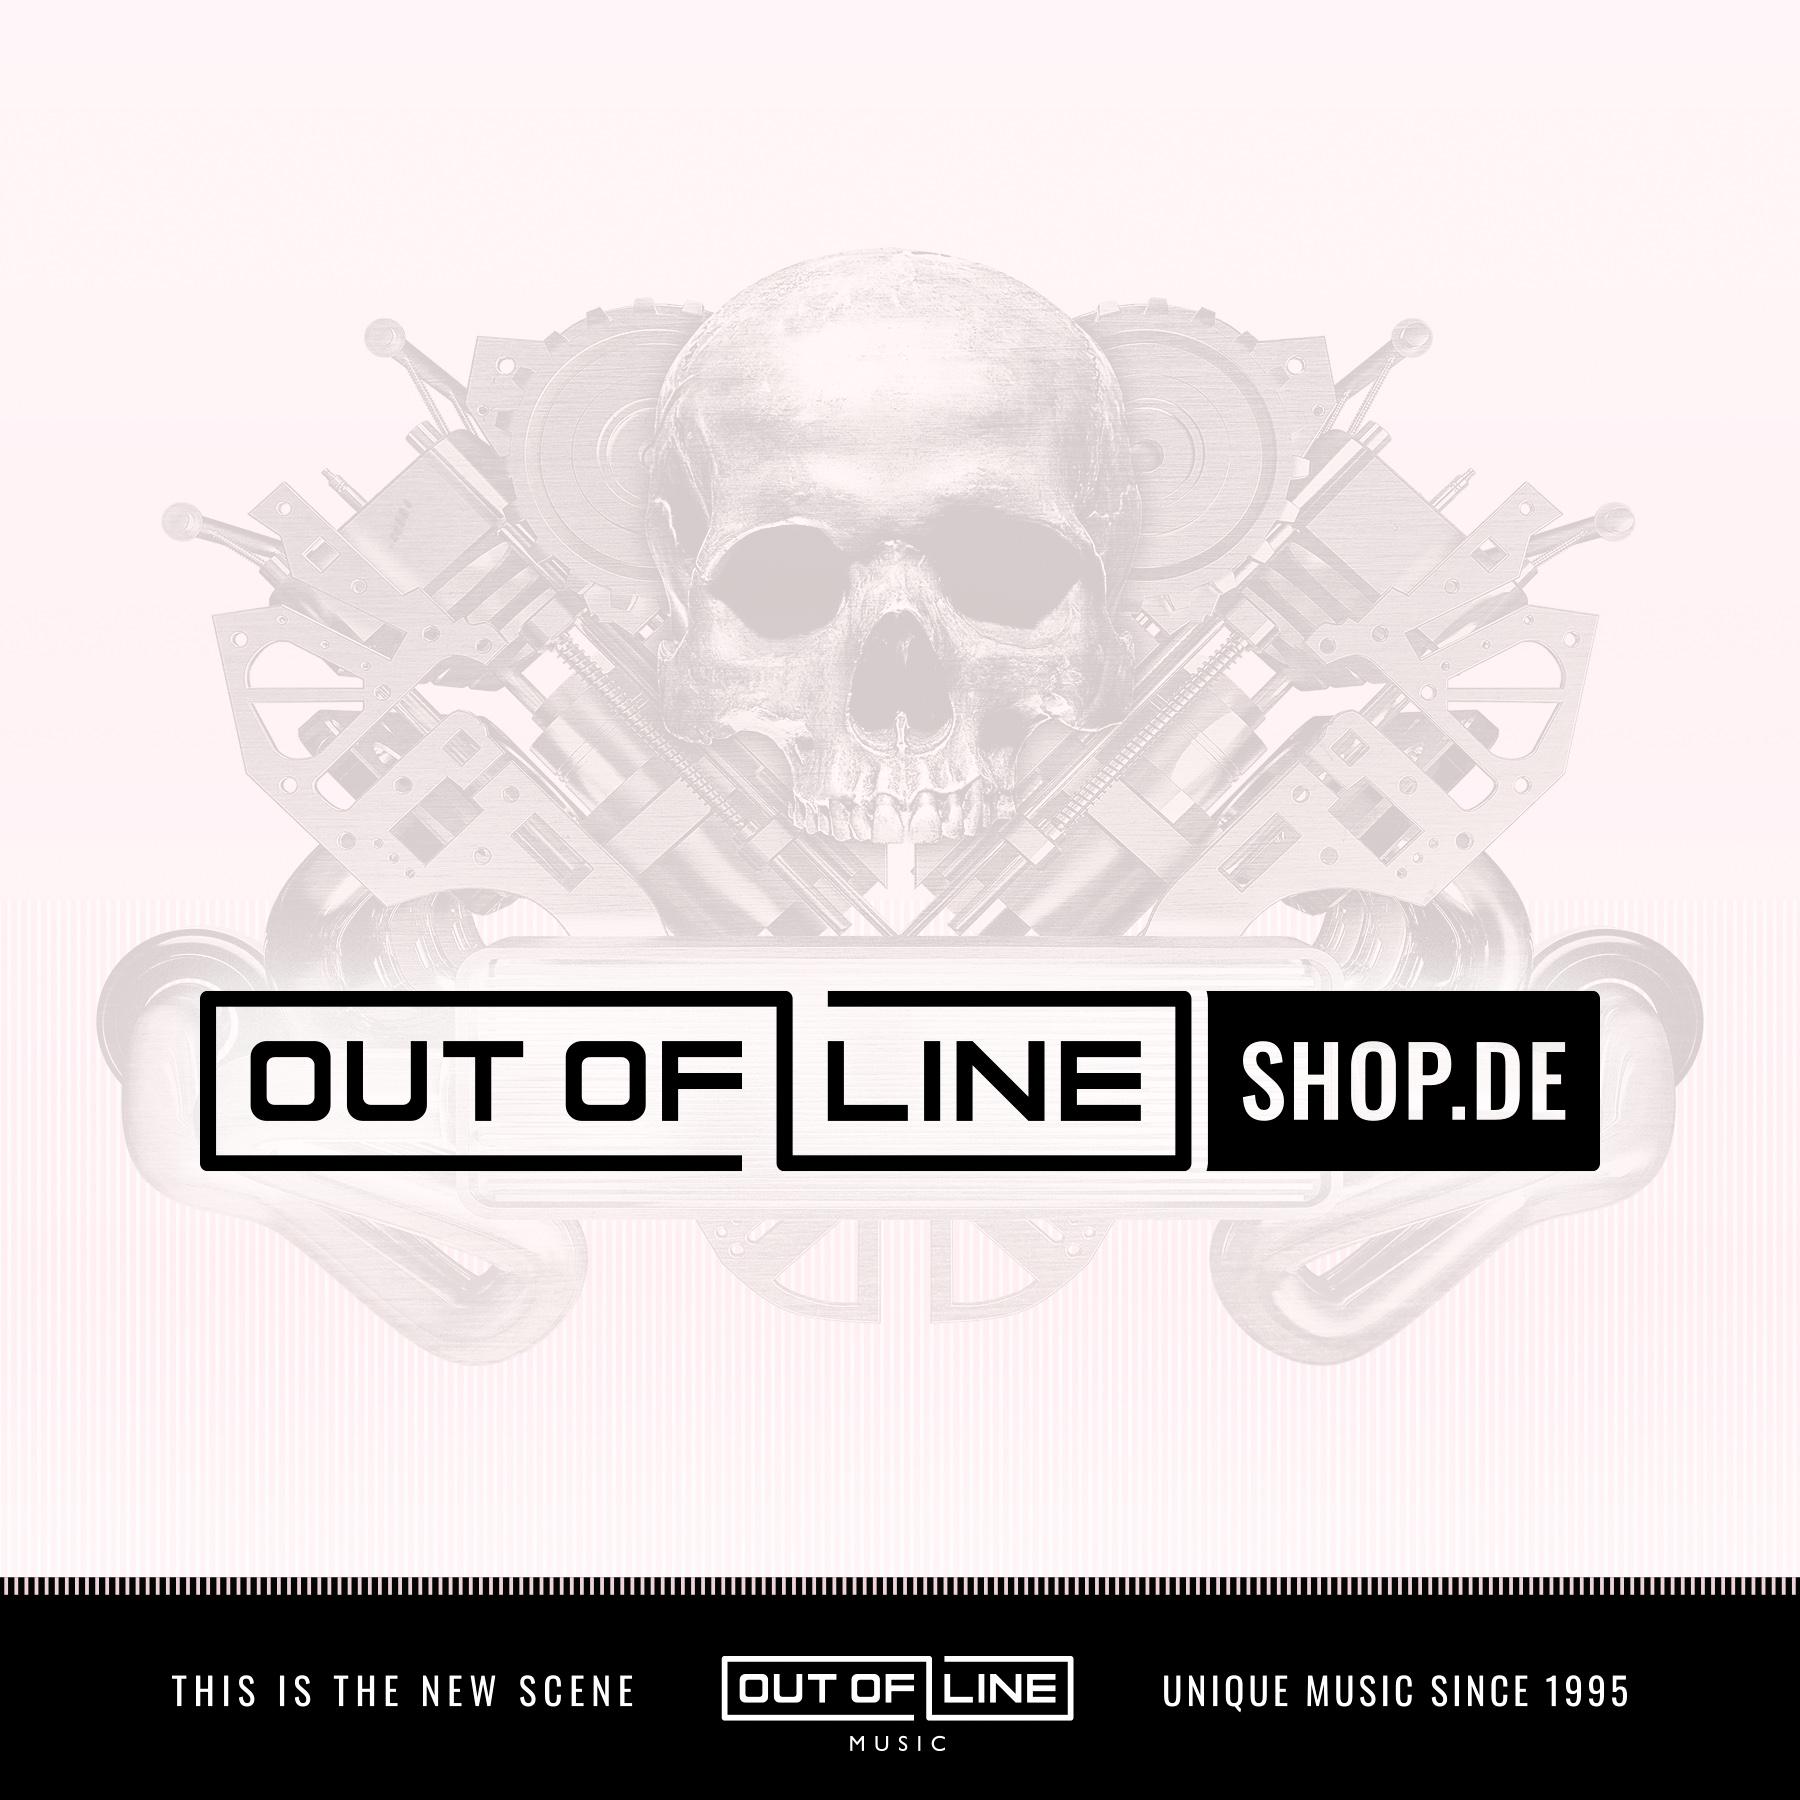 Orplid - Deus Vult (Limited Edition) - CD Book